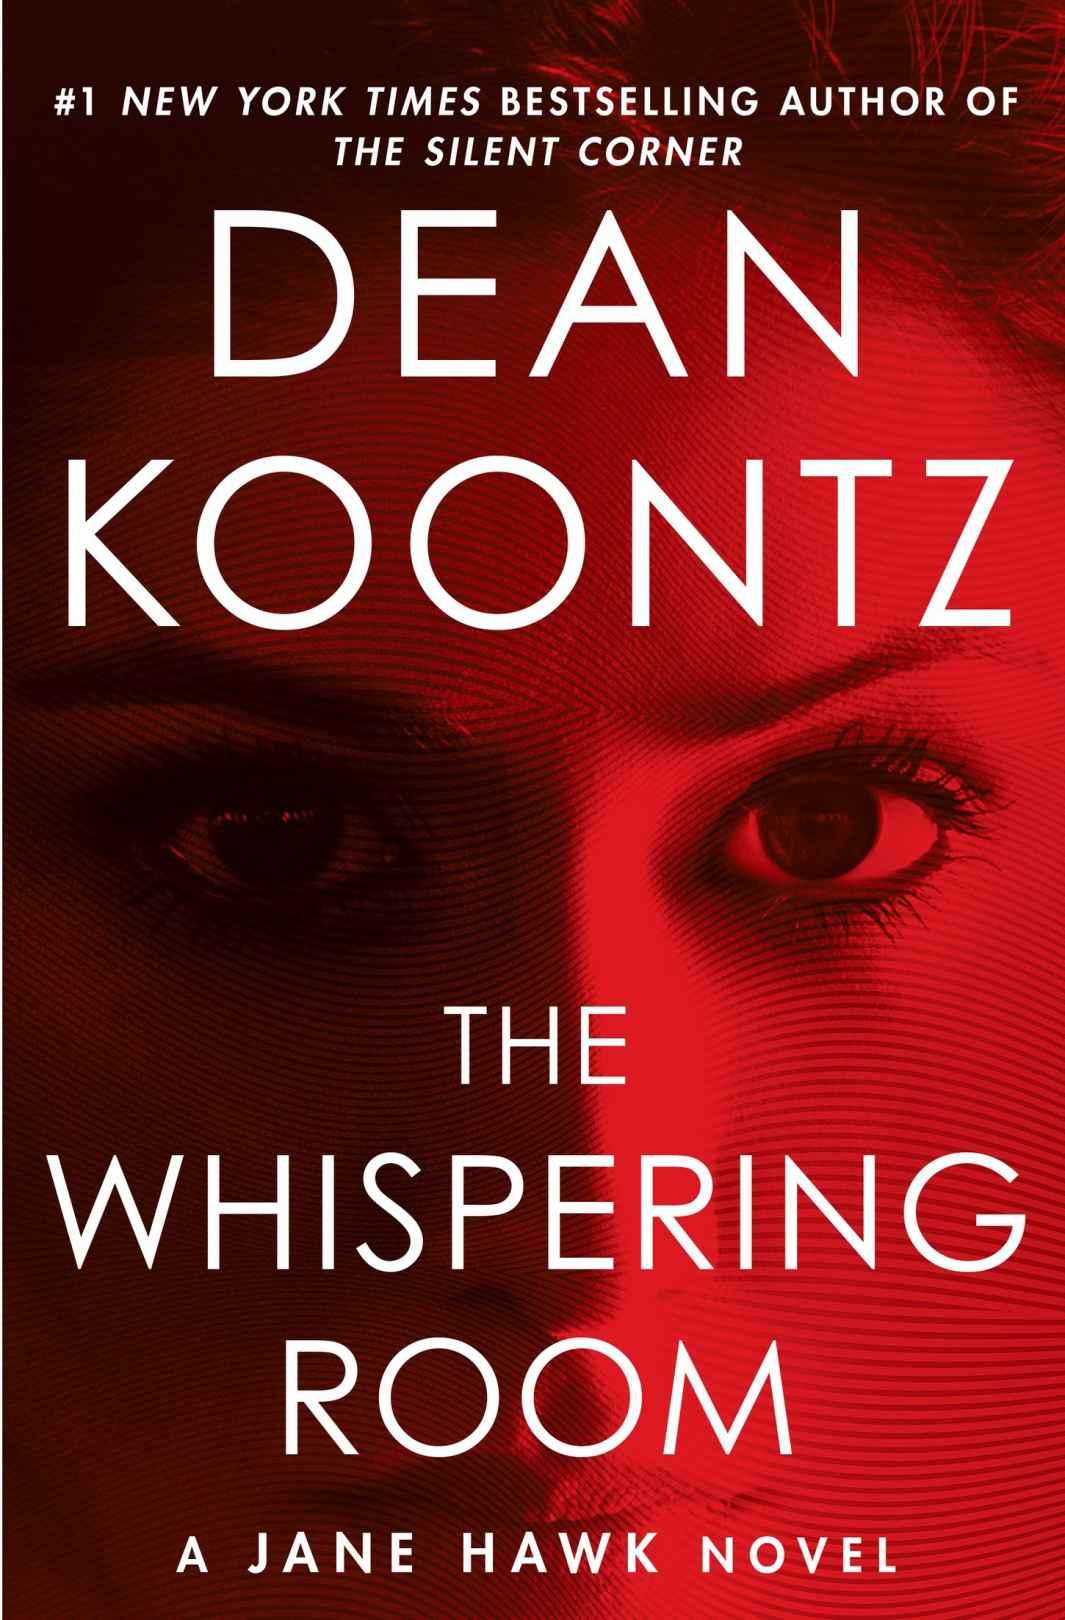 The Whispering Room: A Jane Hawk Novel - Dean Koontz [kindle] [mobi]